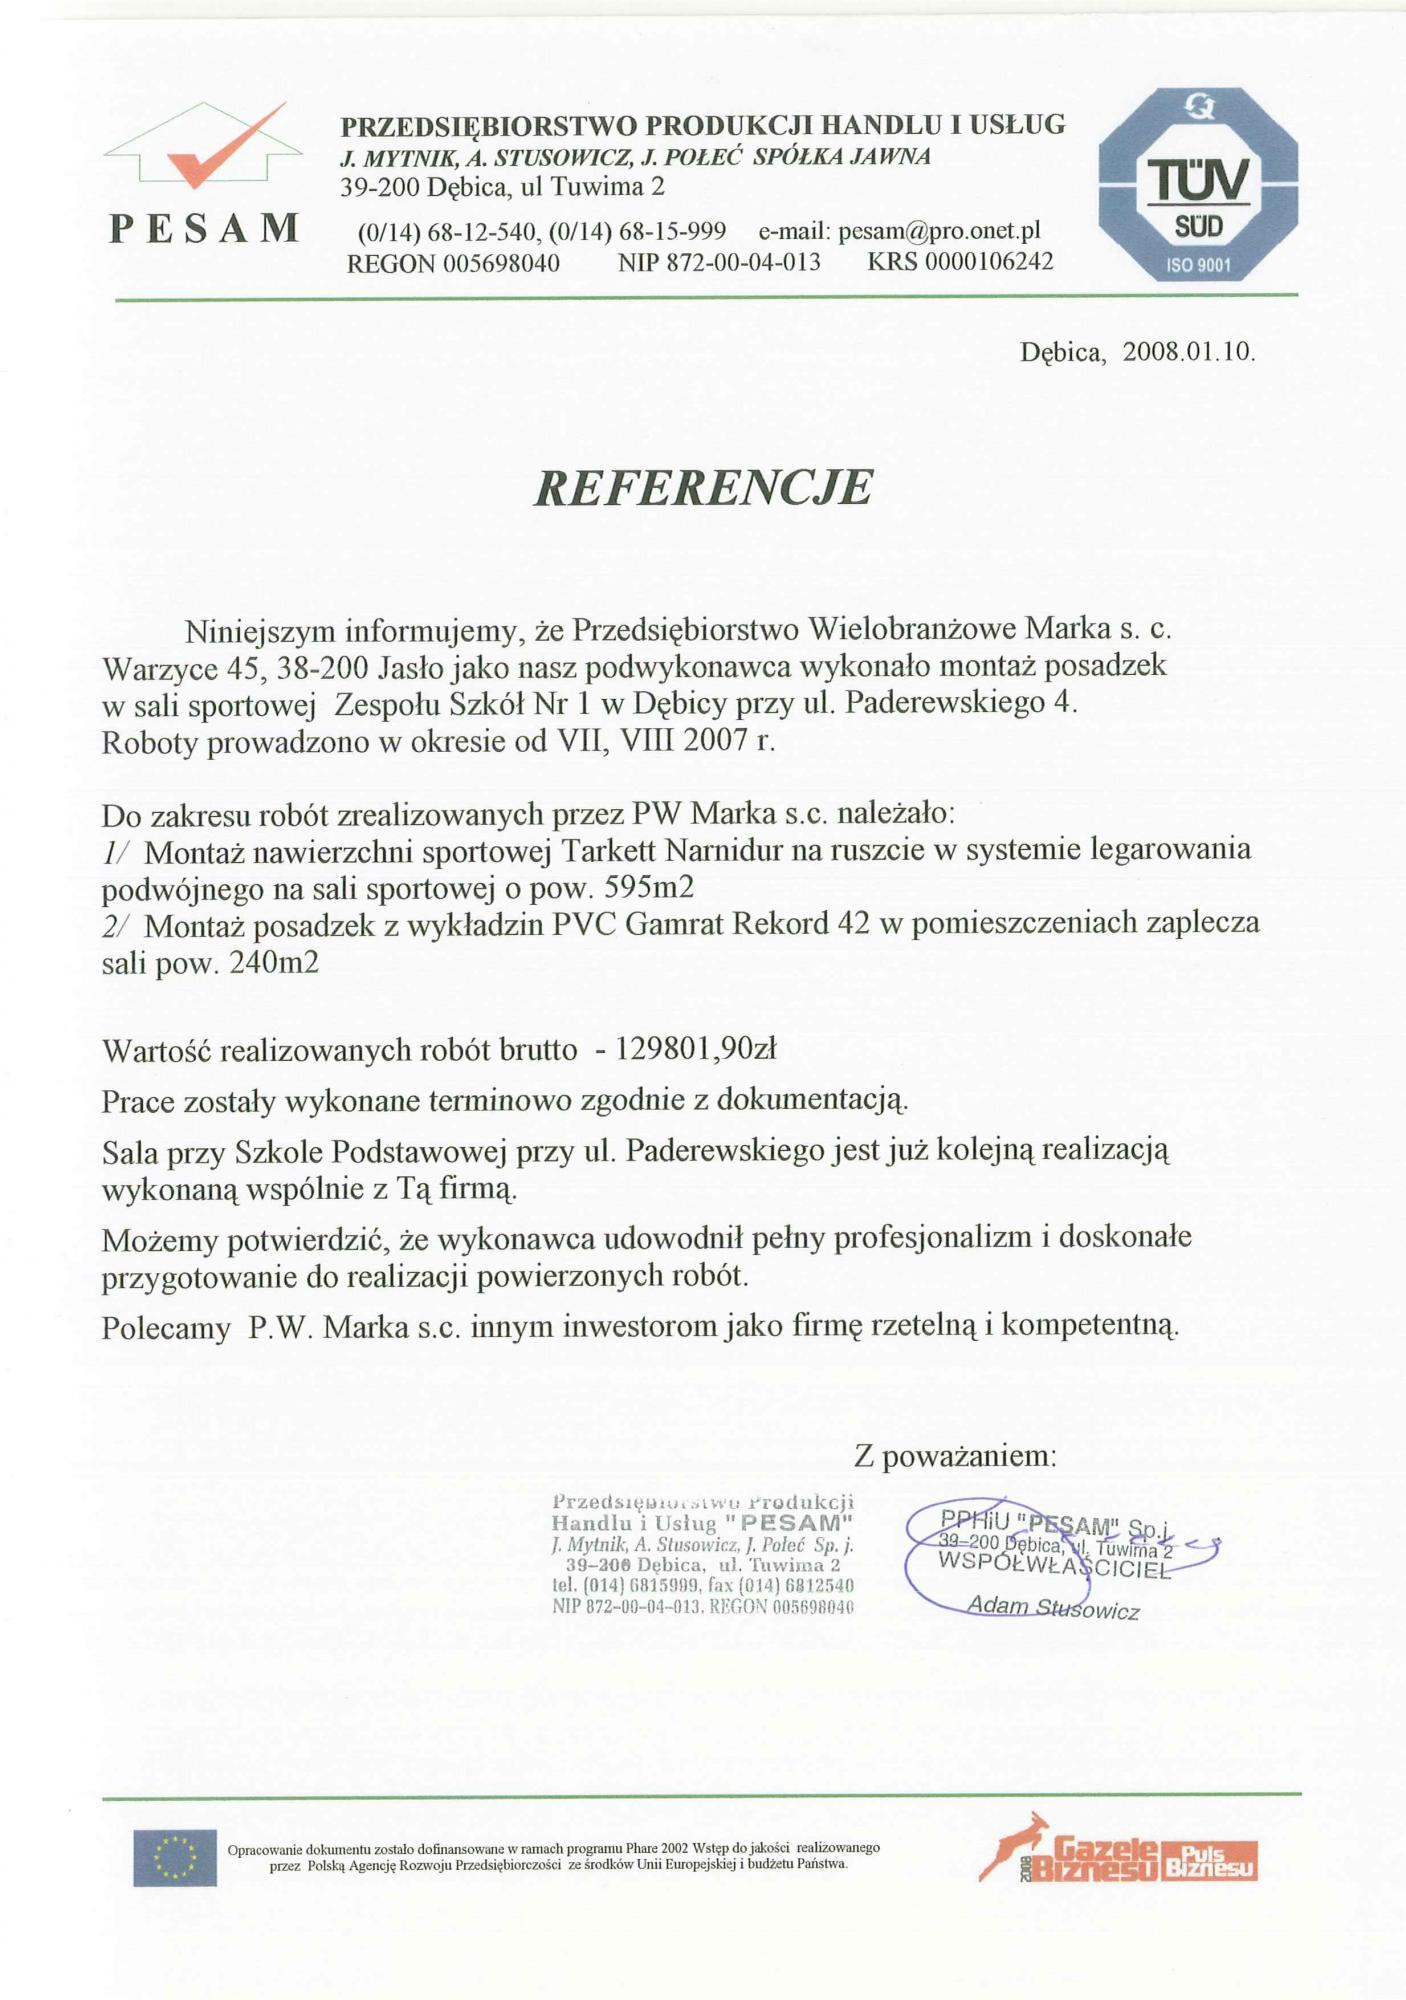 Referencje Pesam 2008